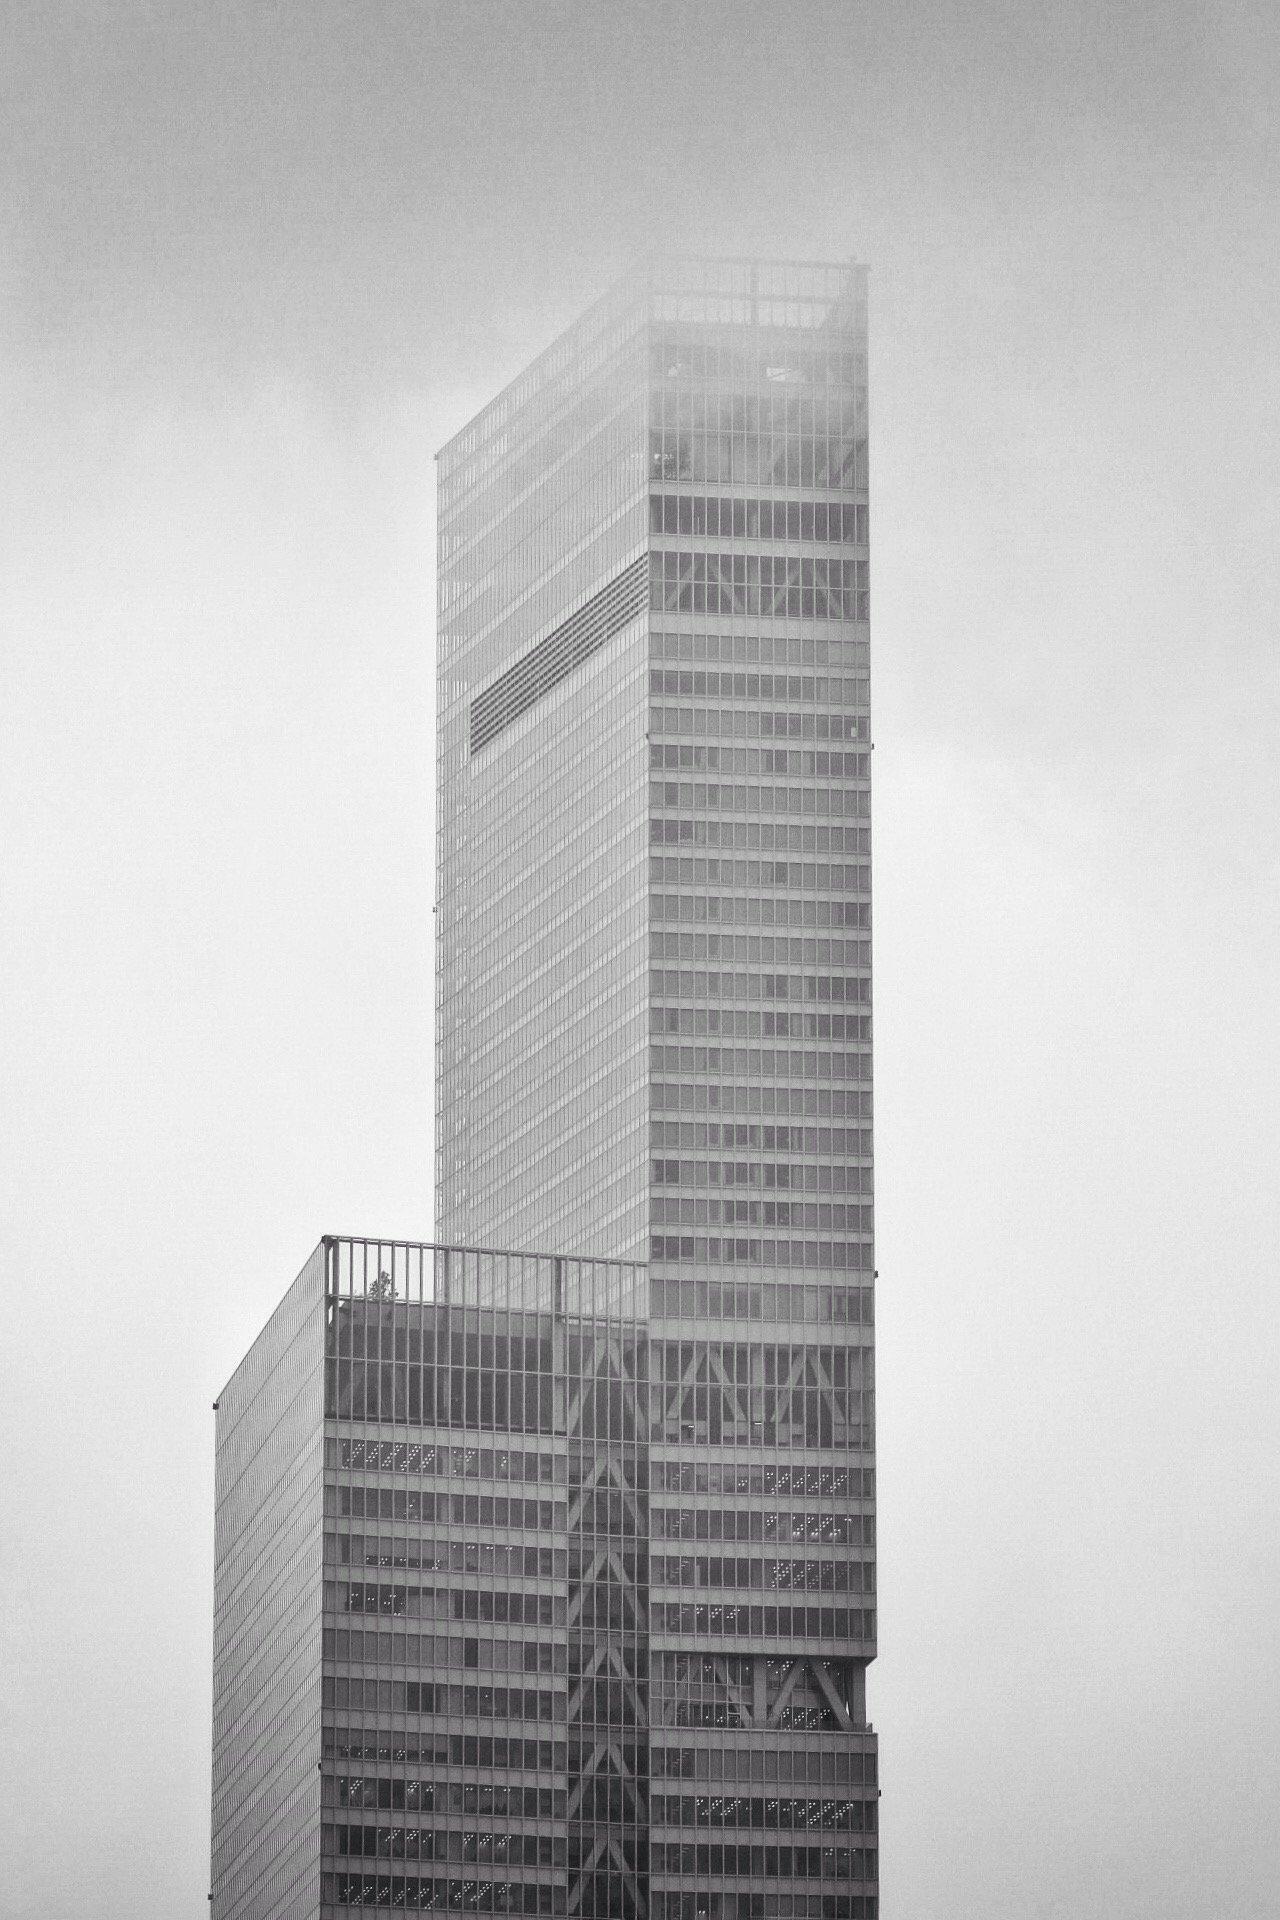 wolkenkratze-osaka-tower-kasuma-fotografie-blog